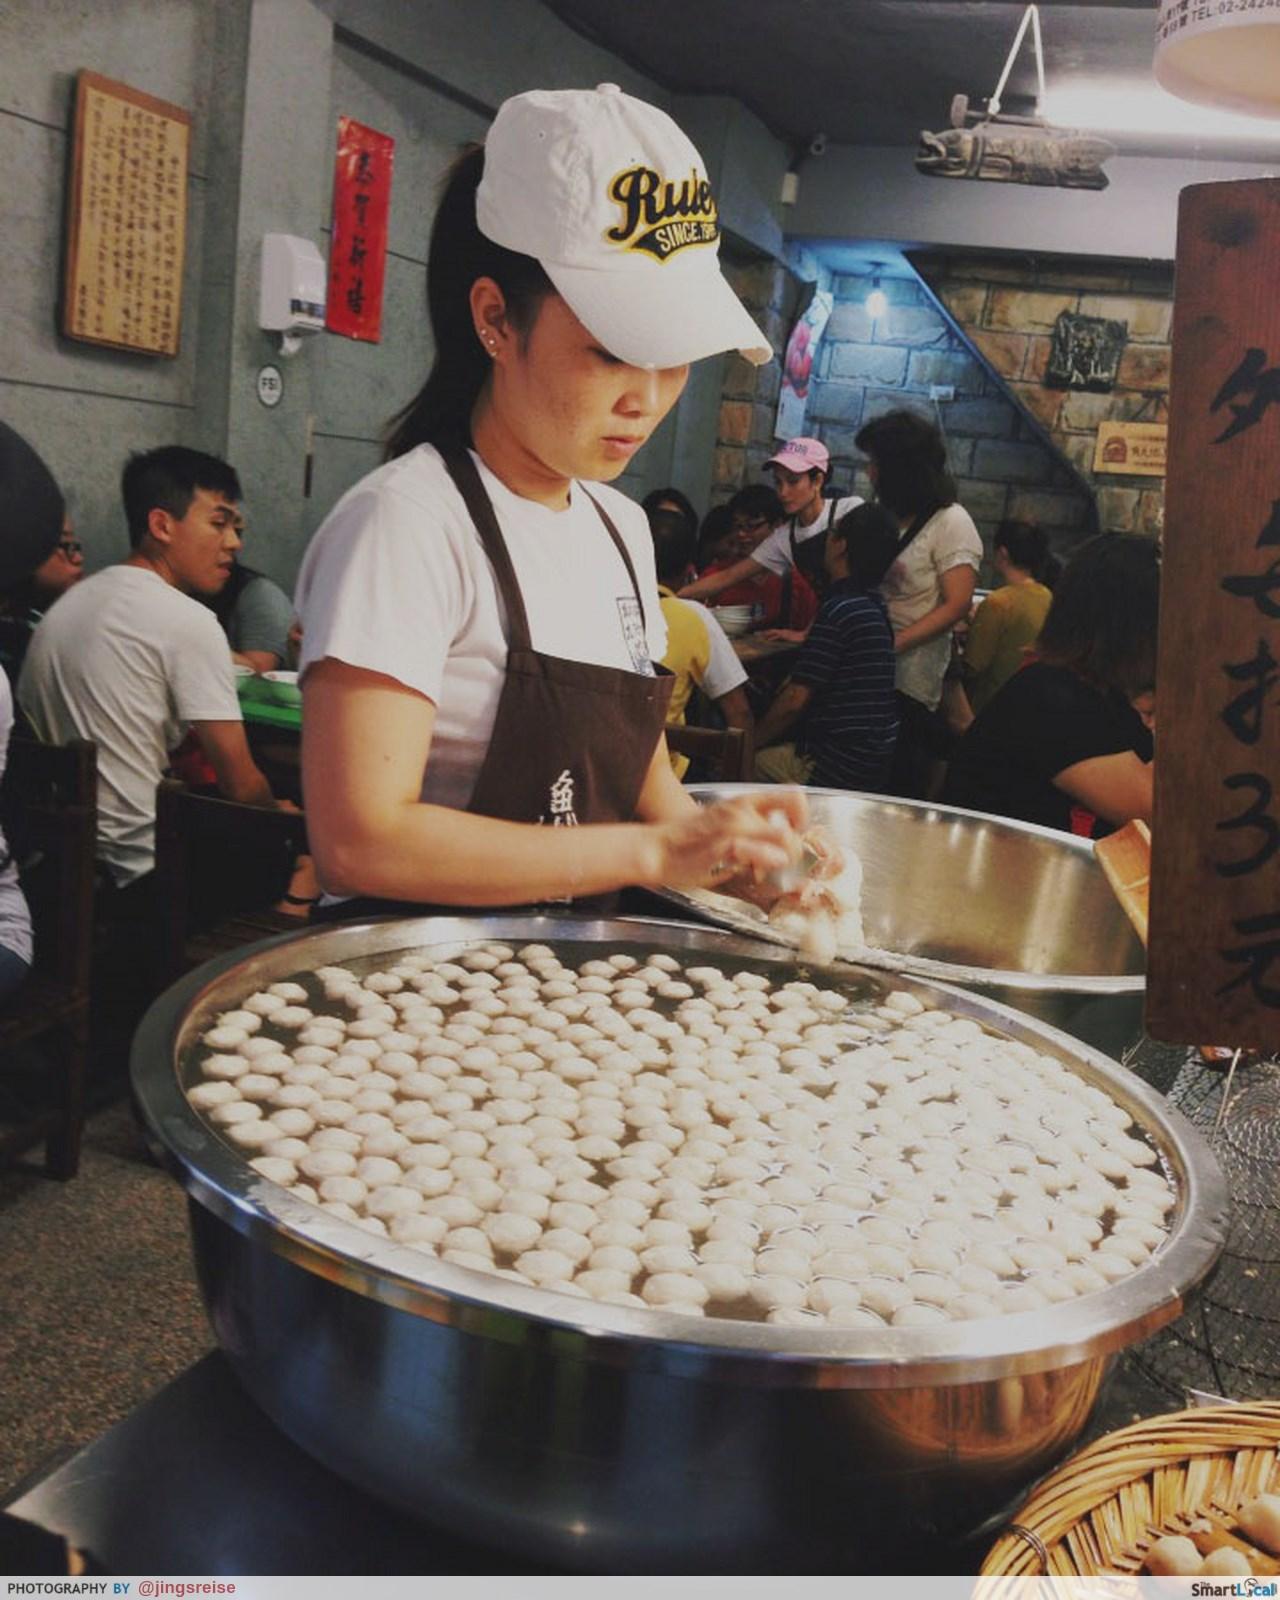 Best Romantic Restaurants in Taipei, Taiwan: Find TripAdvisor traveler reviews.